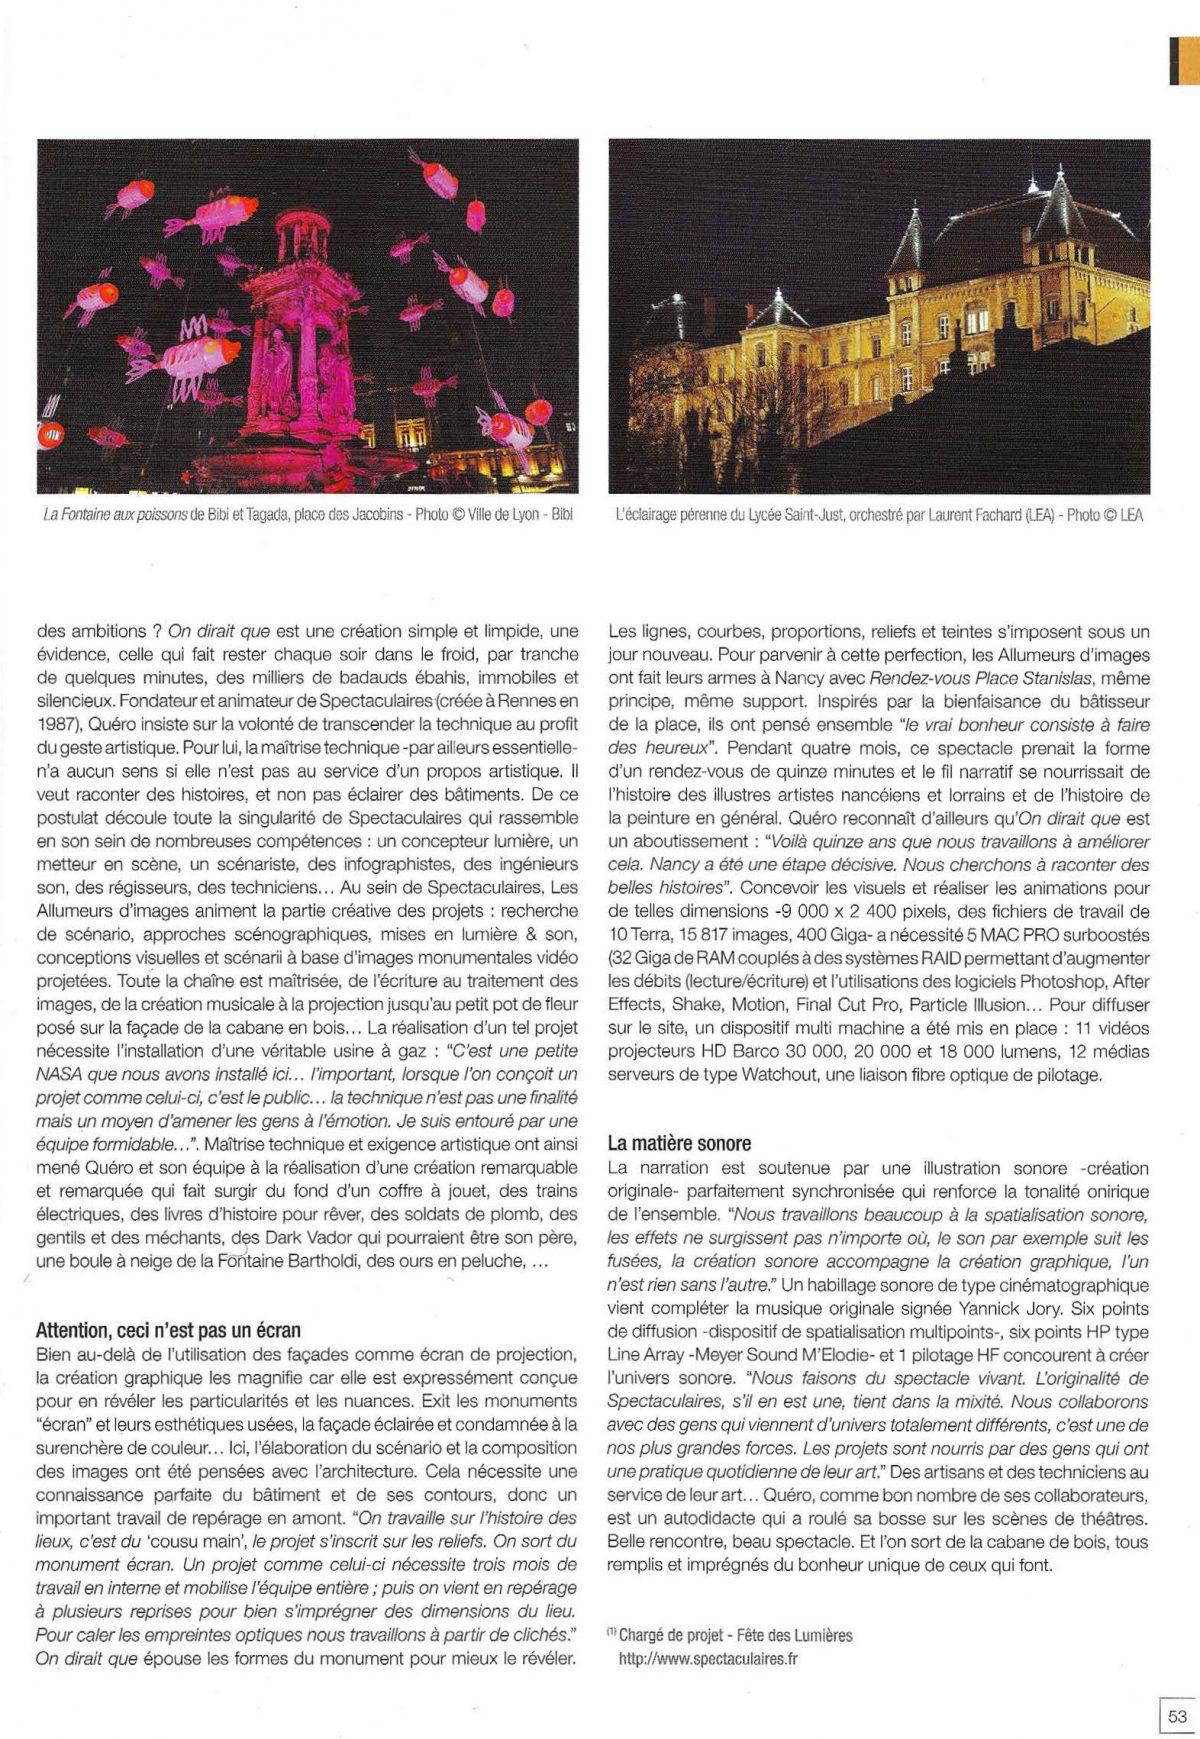 2009-01-bibi-scenographie1